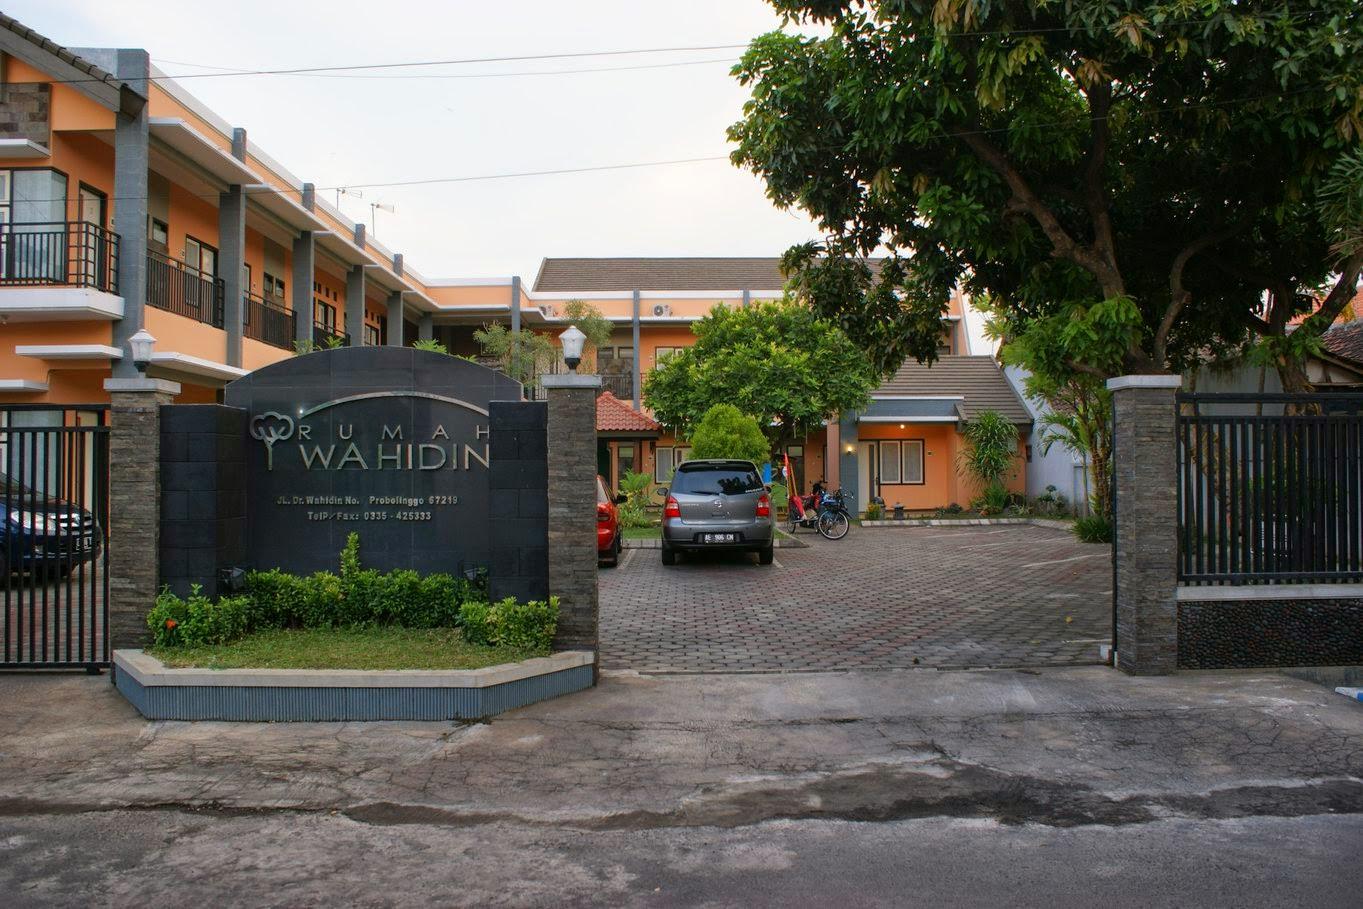 Rumah Wahidin - Probolinggo City